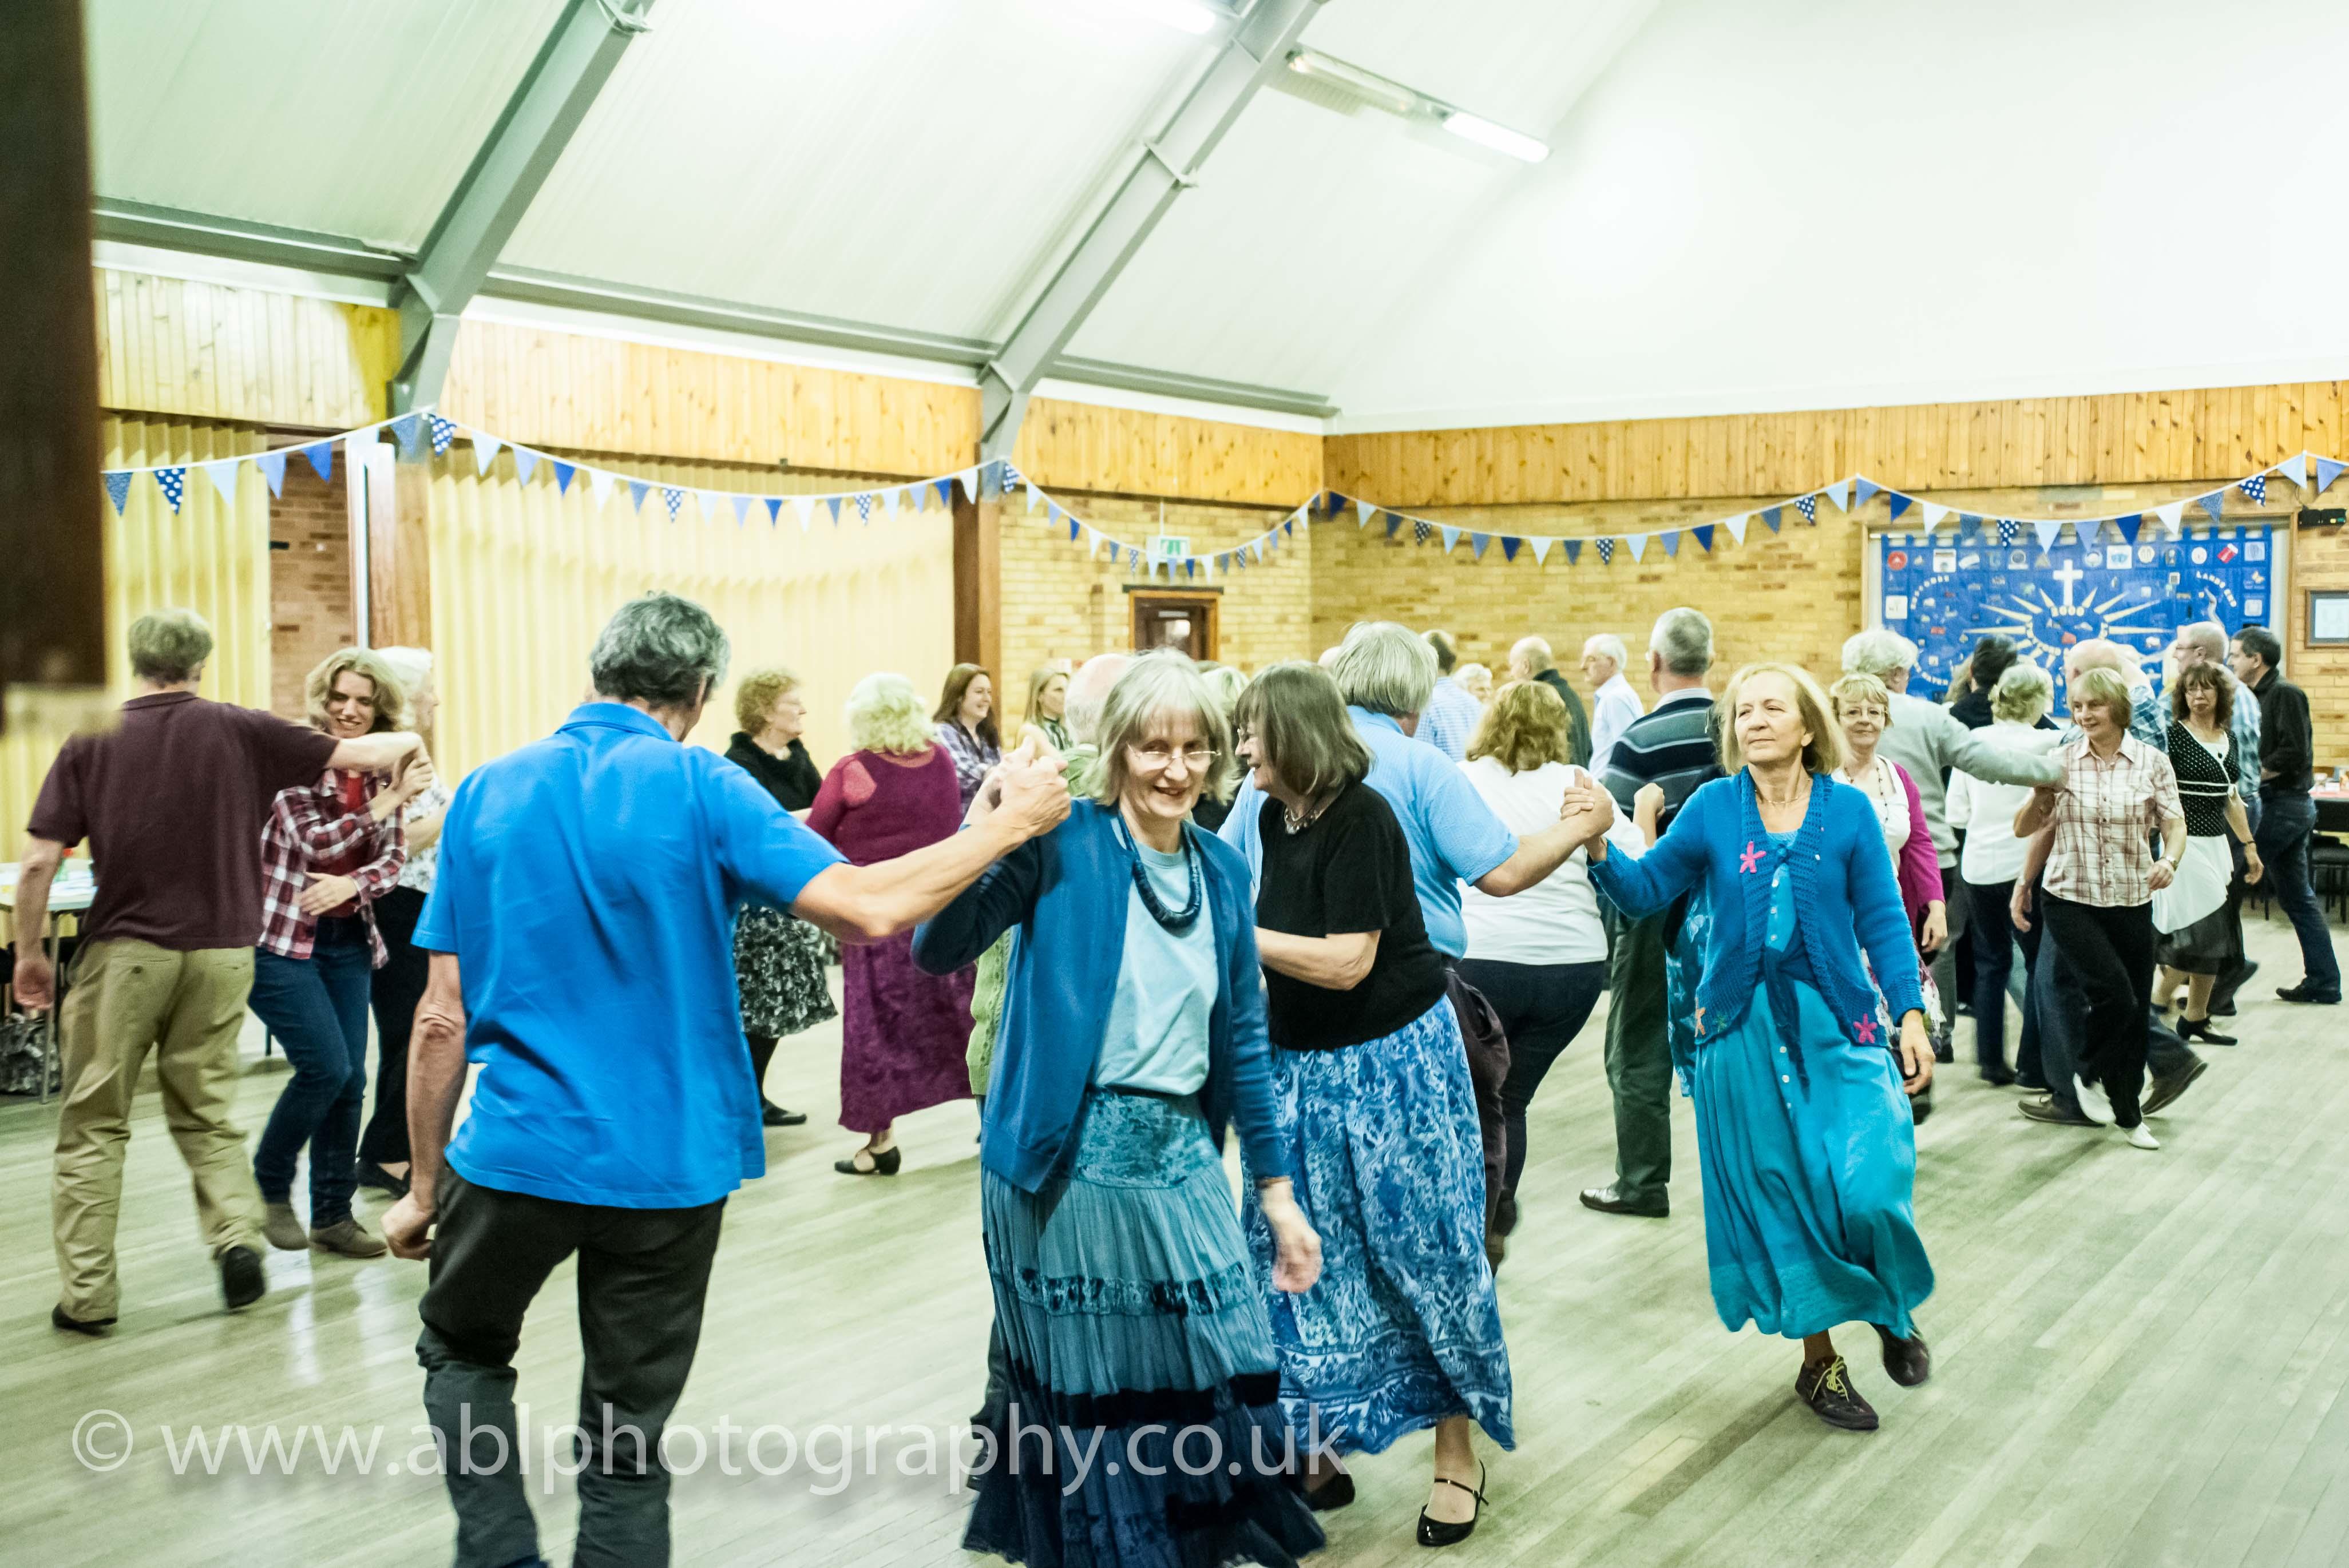 Dimentia trust barn dance-2964